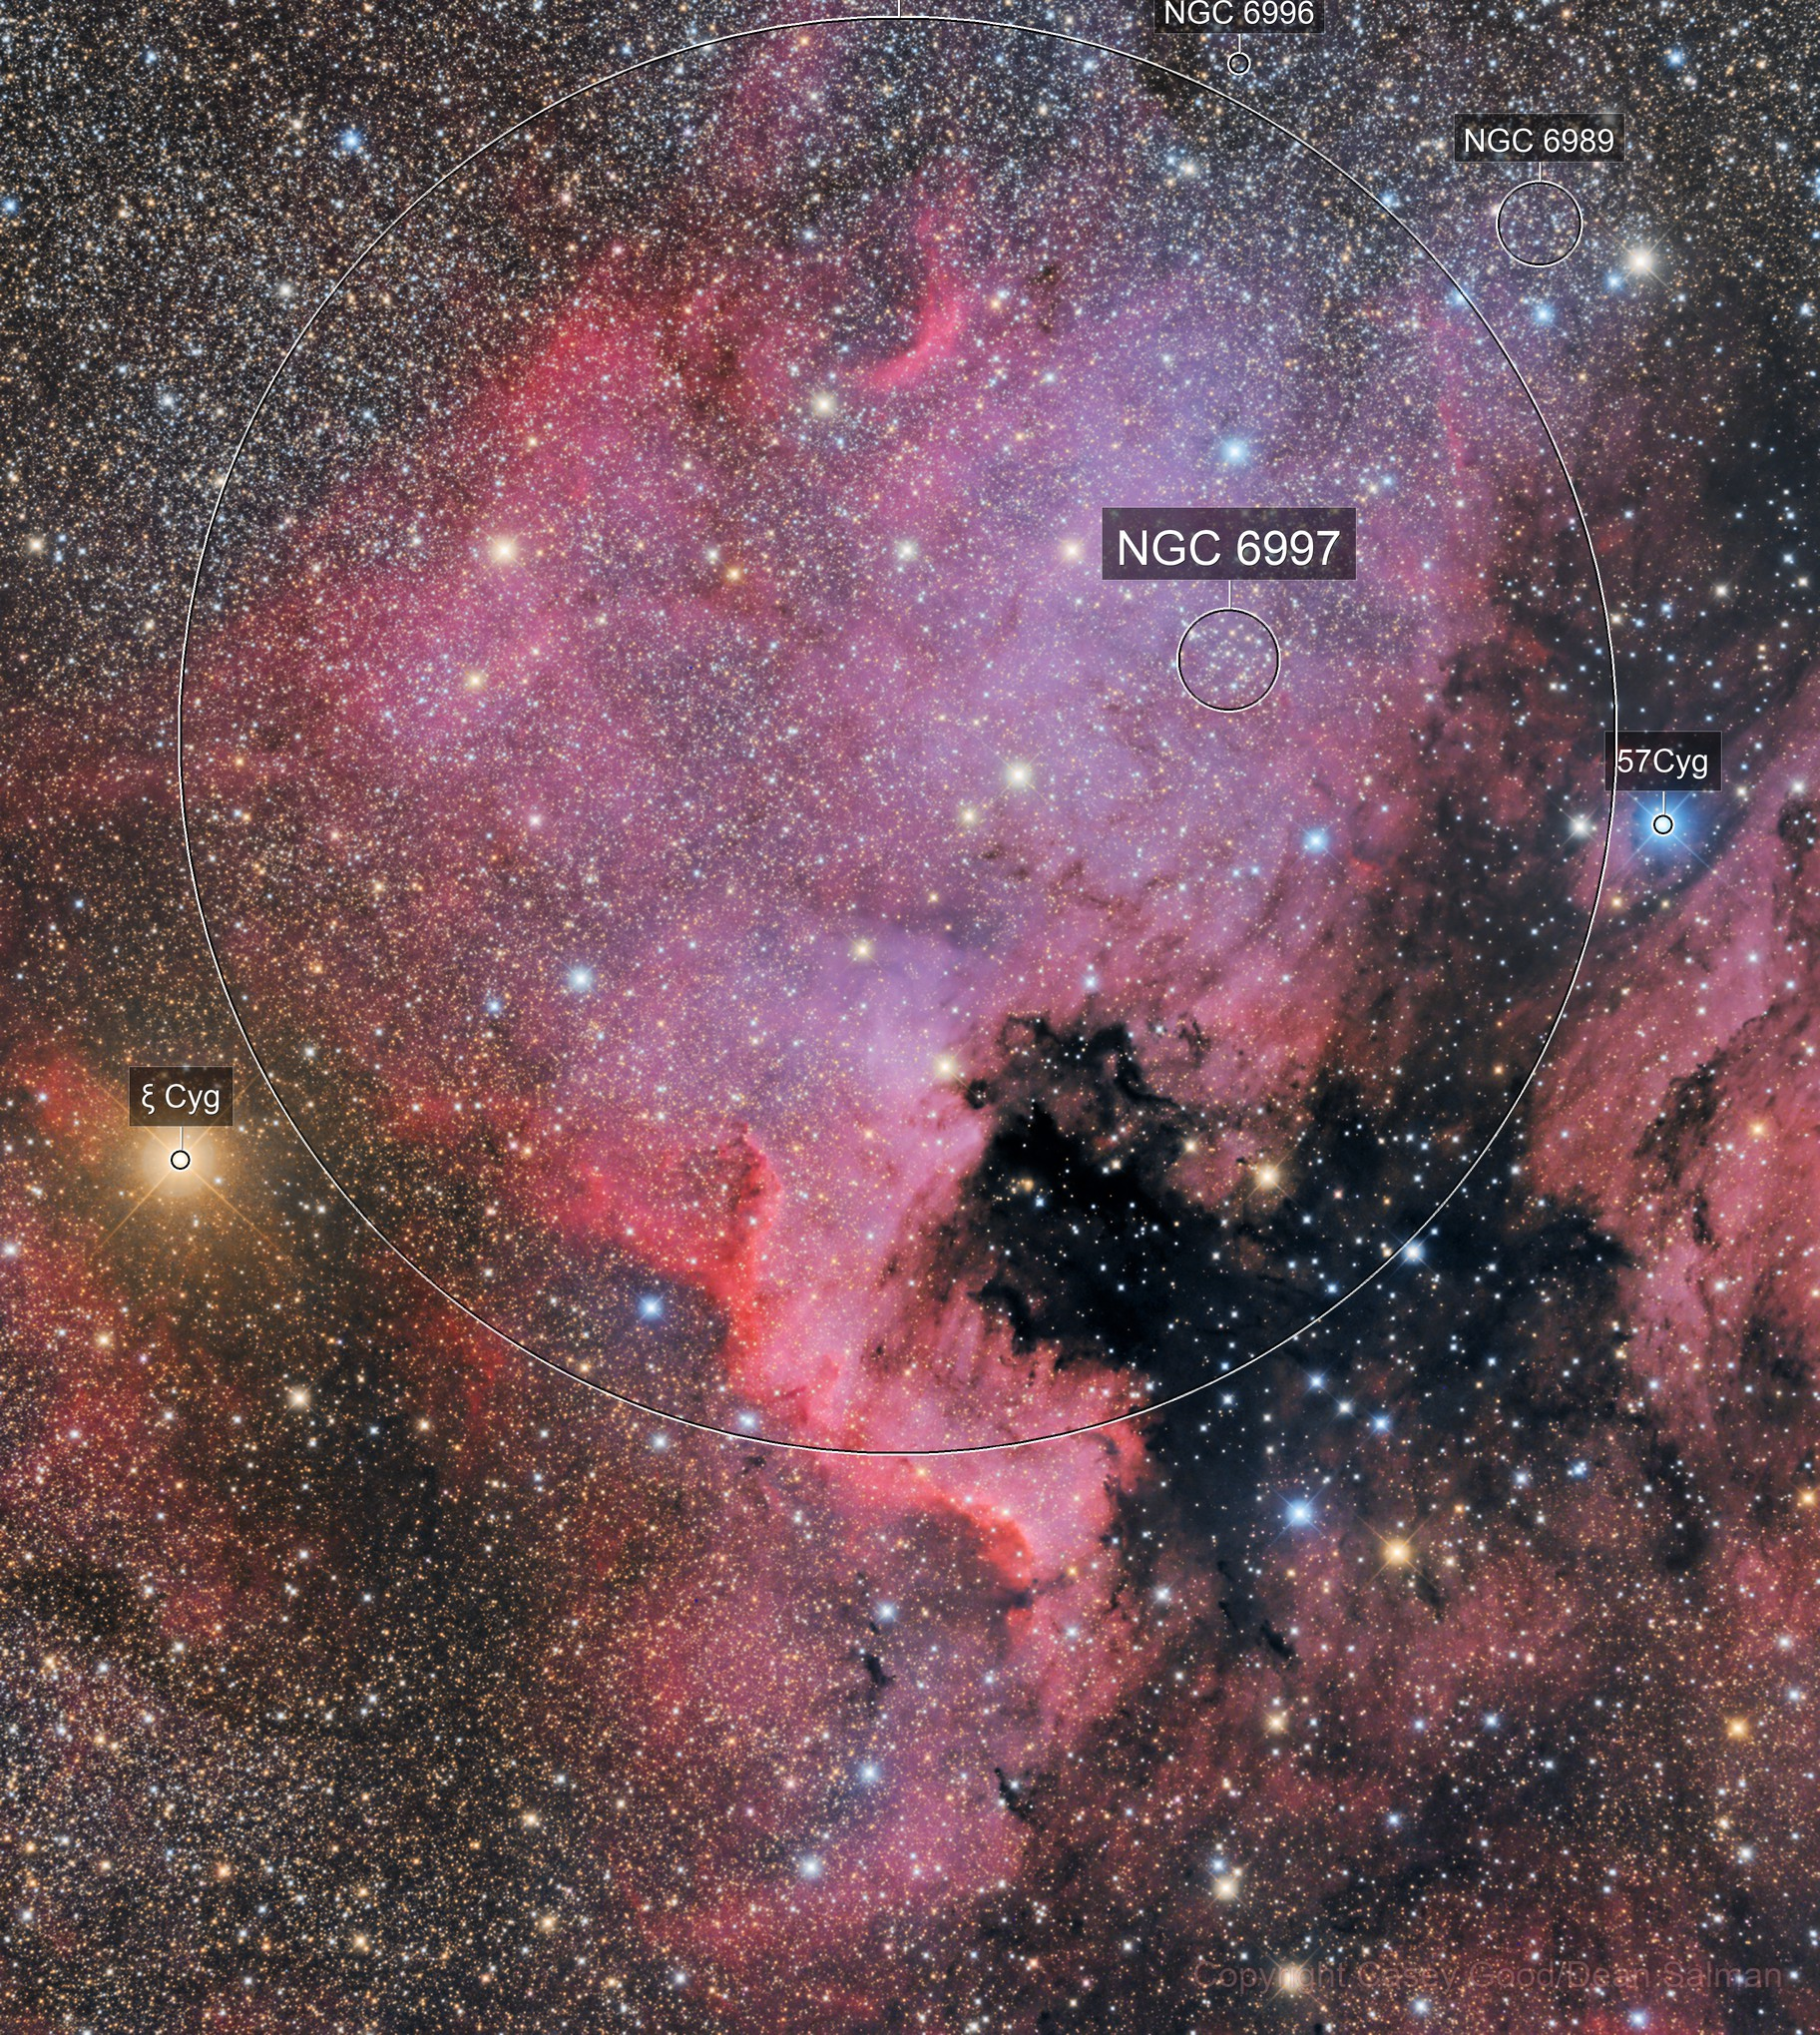 NGC 7000 RGB 2 Panel Mosaic